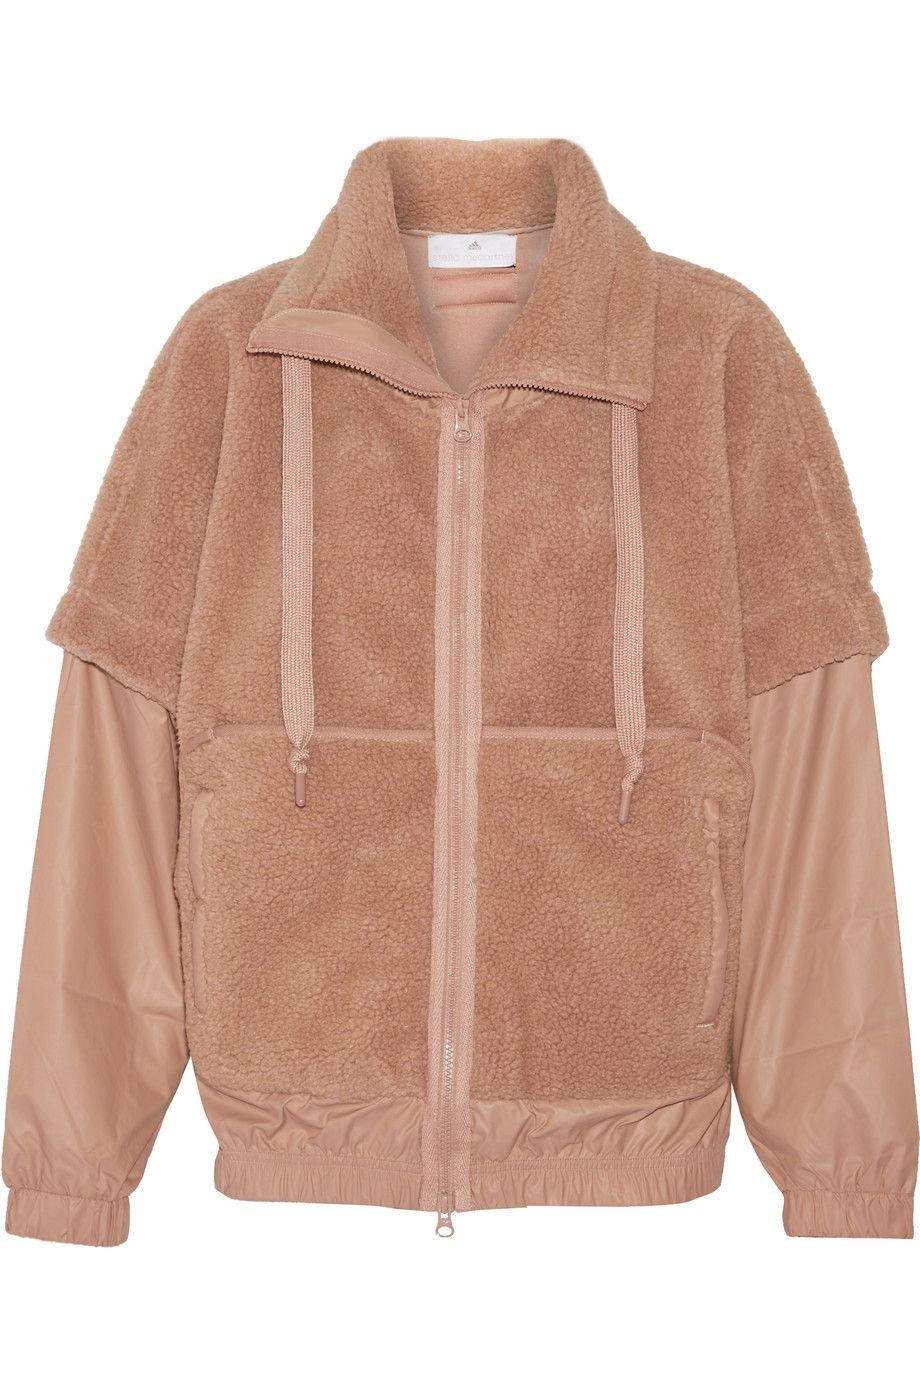 40071676c6 ADIDAS BY STELLA MCCARTNEY Faux Fur And Shell Jacket.  #adidasbystellamccartney #cloth #jacket